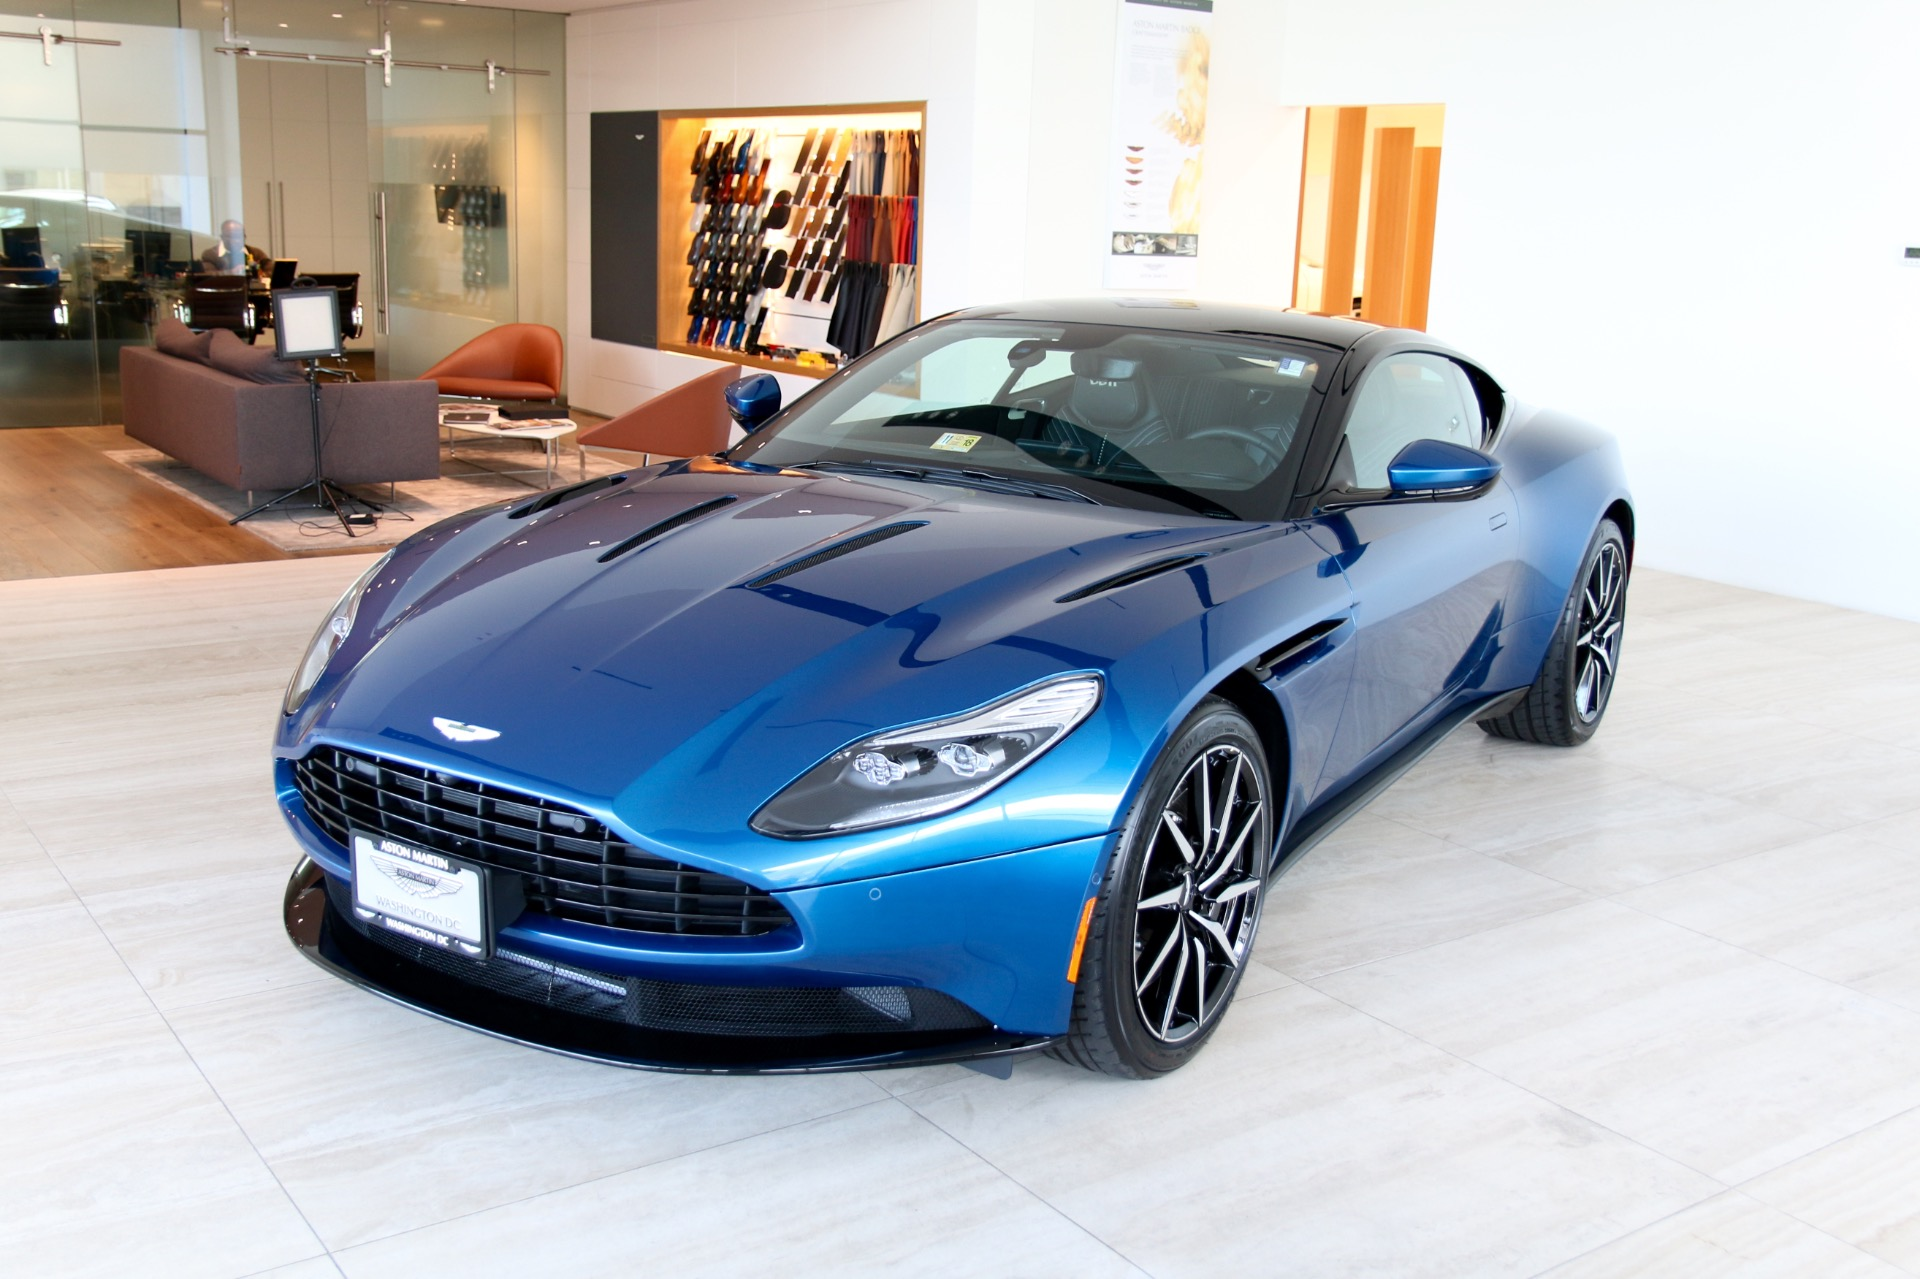 2018 Aston Martin Db11 V12 Stock 8n03312 For Sale Near Vienna Va